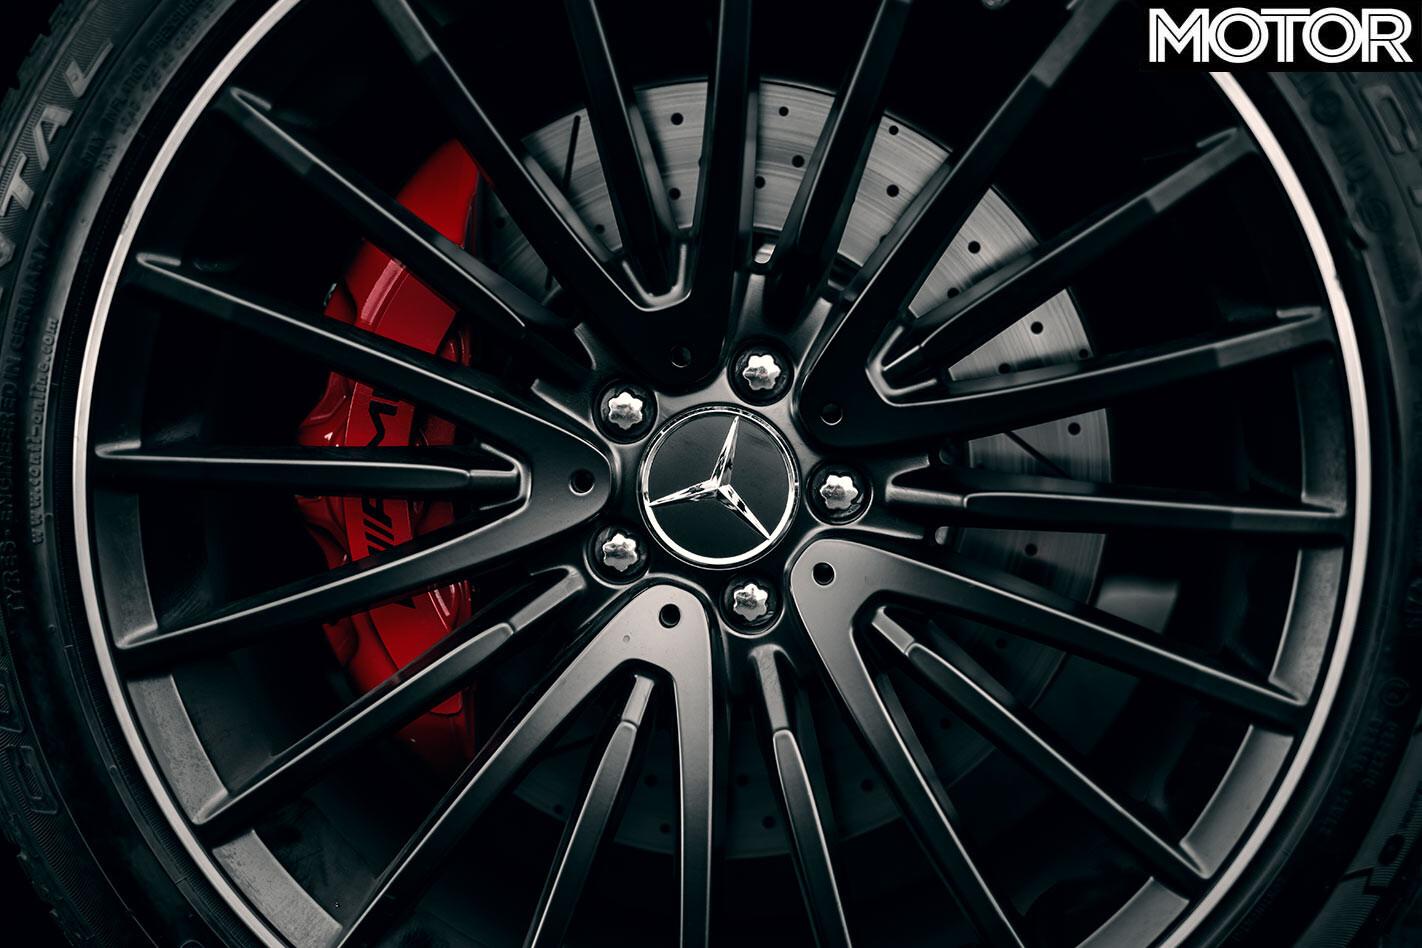 Mercedes-Benz GLC63 S wheel